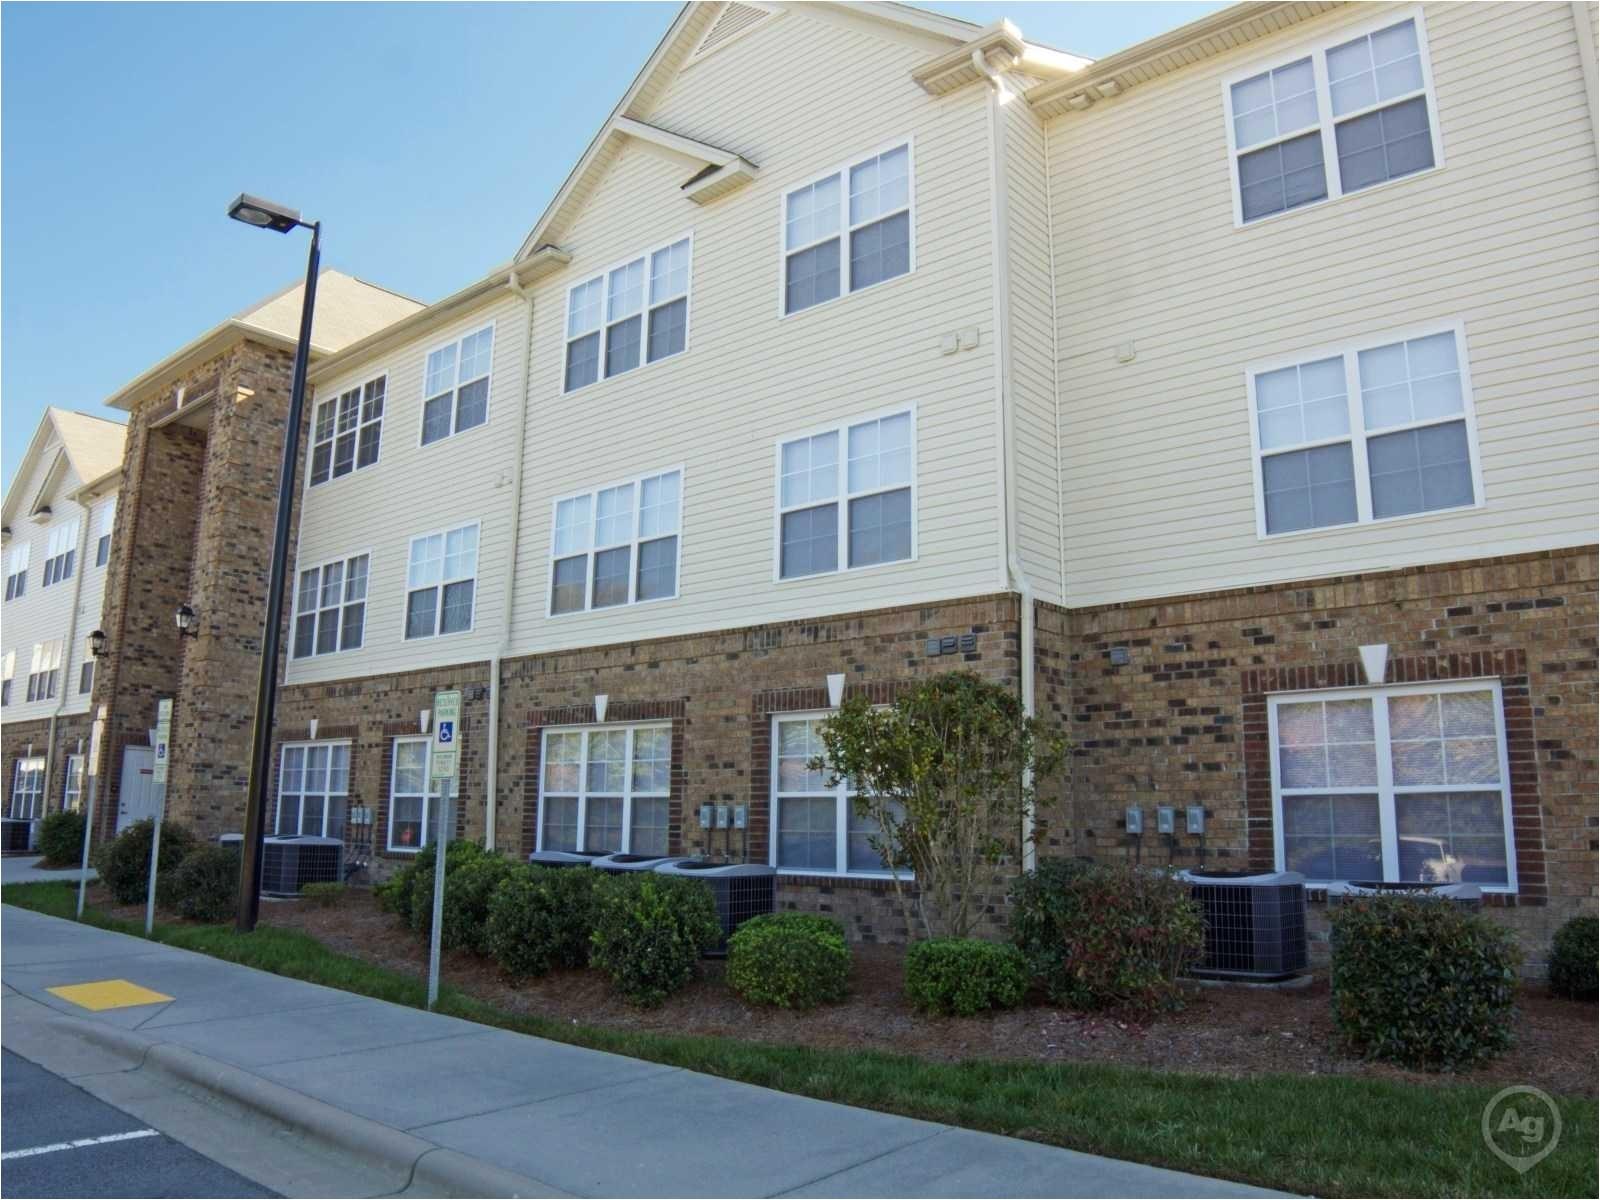 apartment village lovely rehobeth pointe apartments greensboro nc